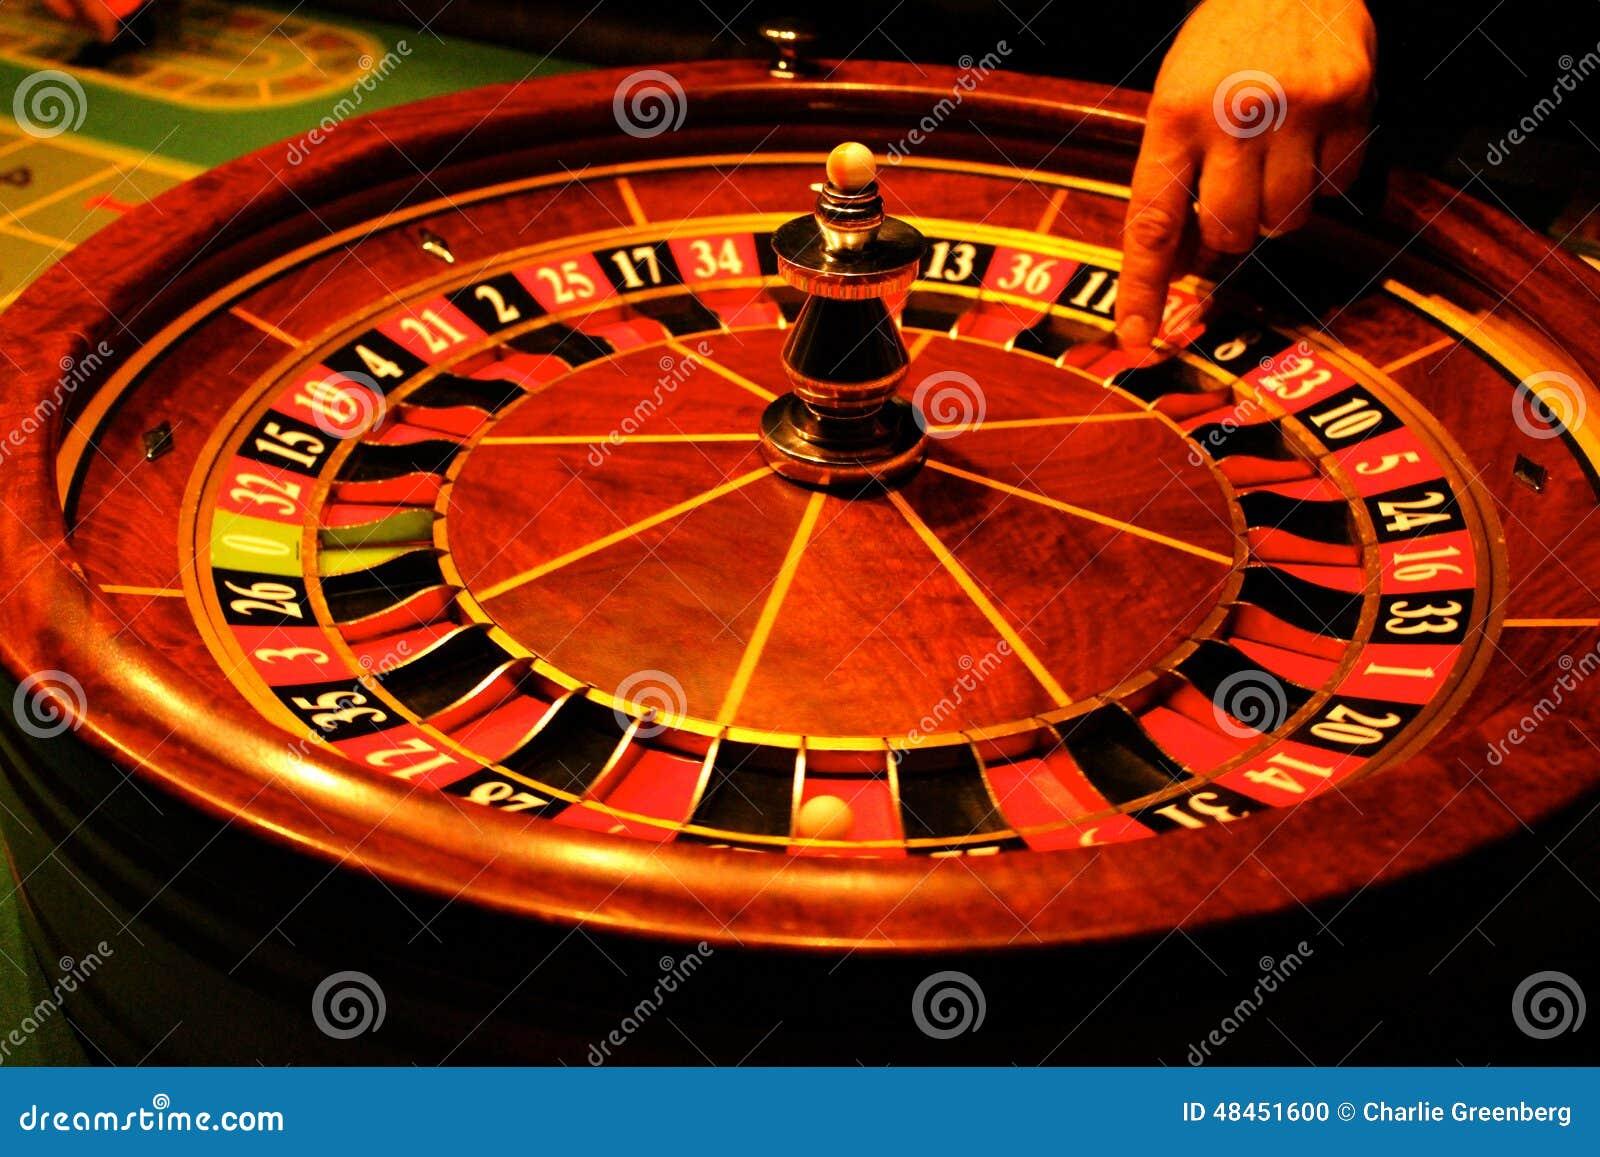 Roulette Mit Max